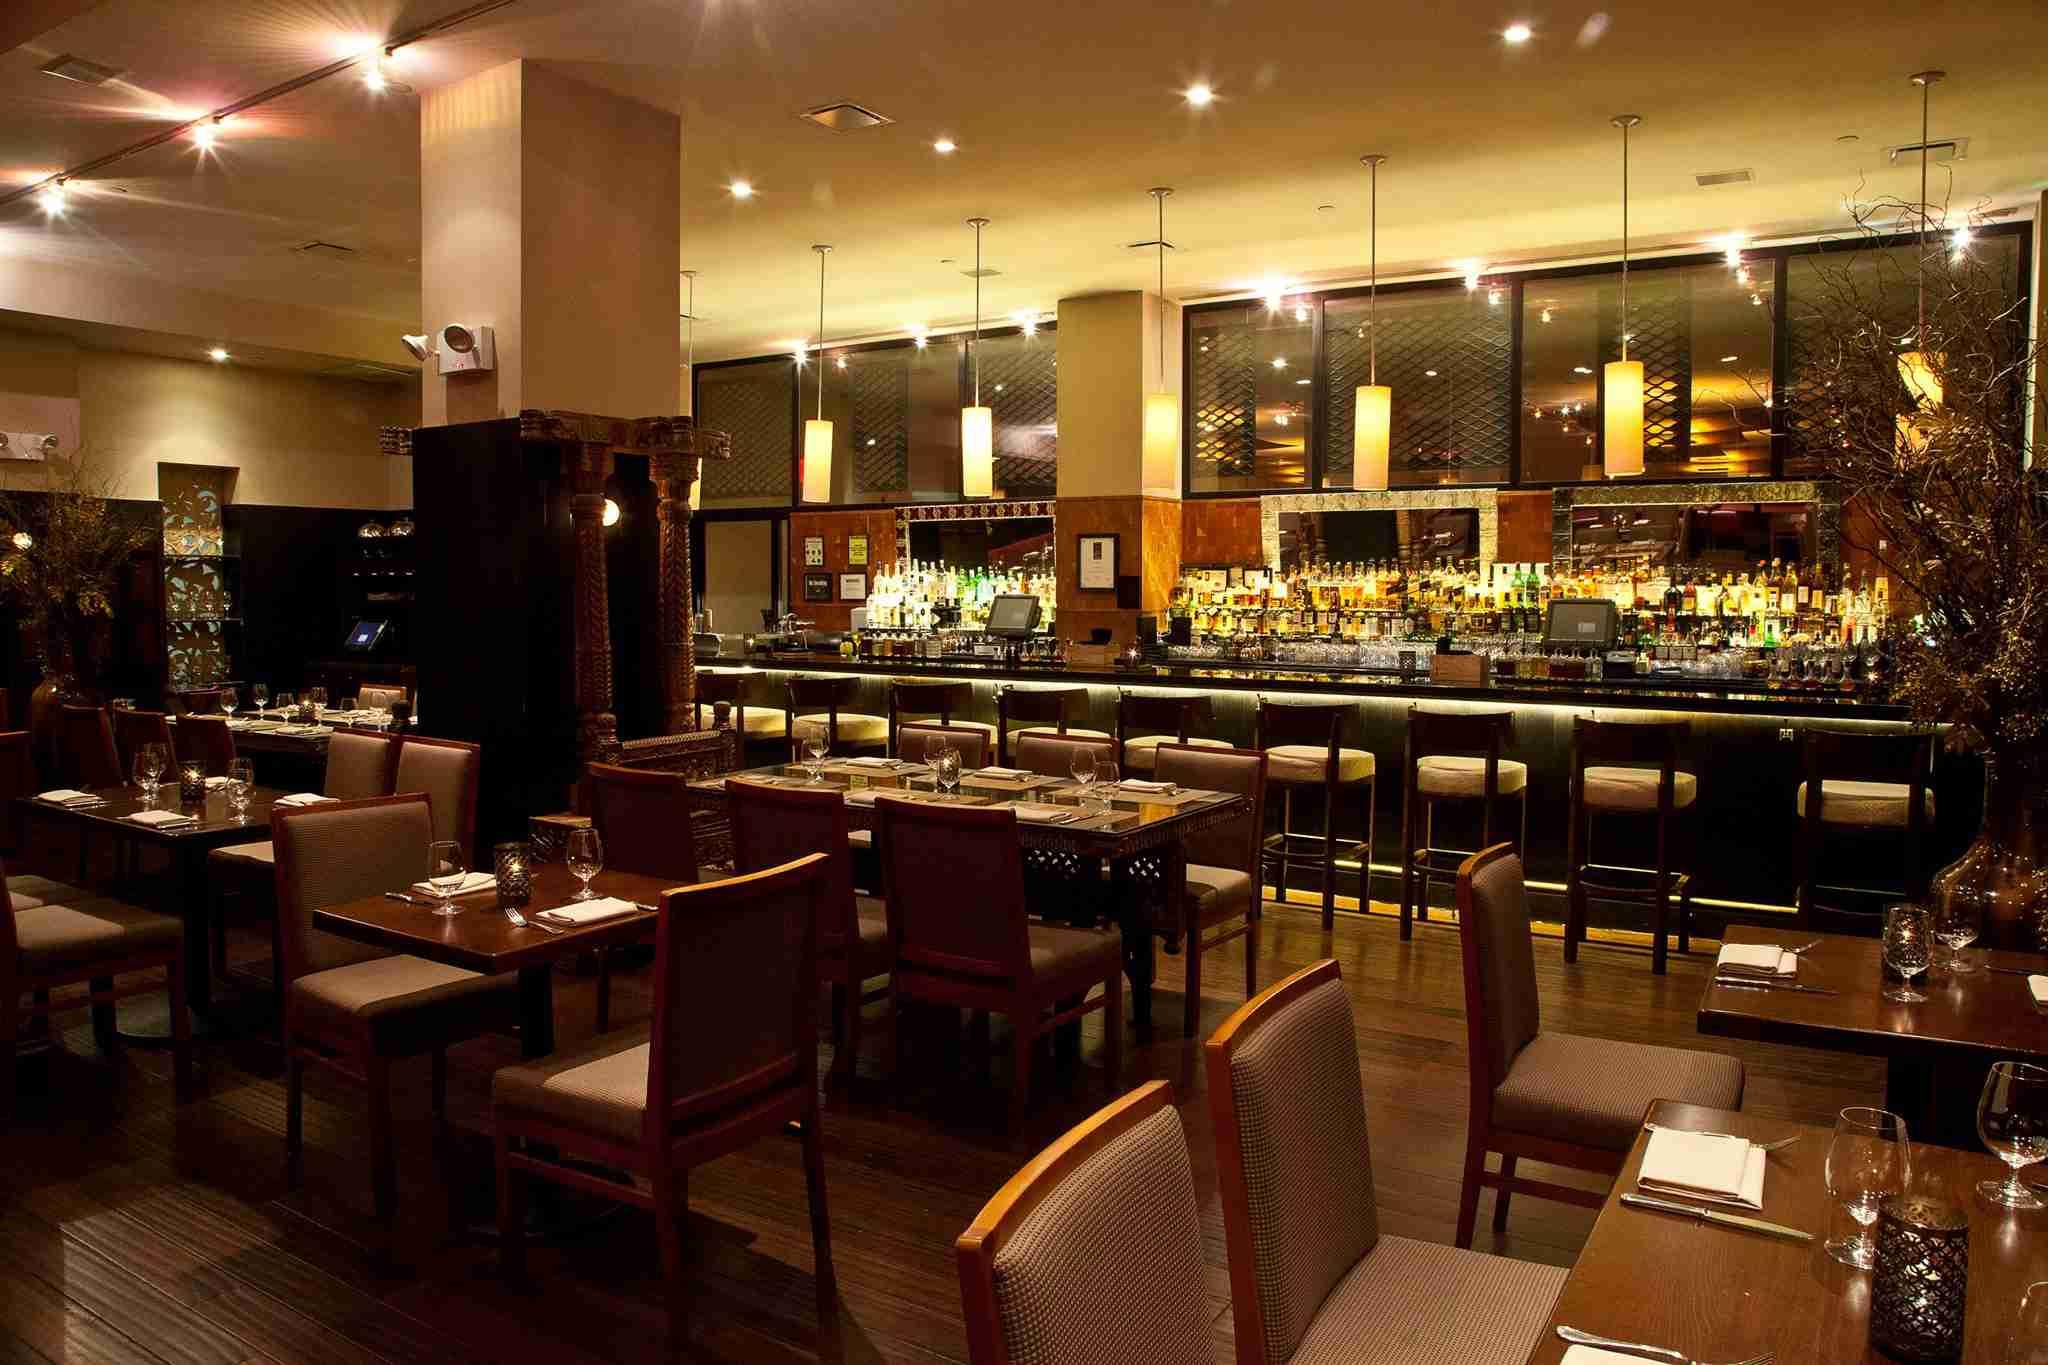 New Year's Eve Restaurants in New York City